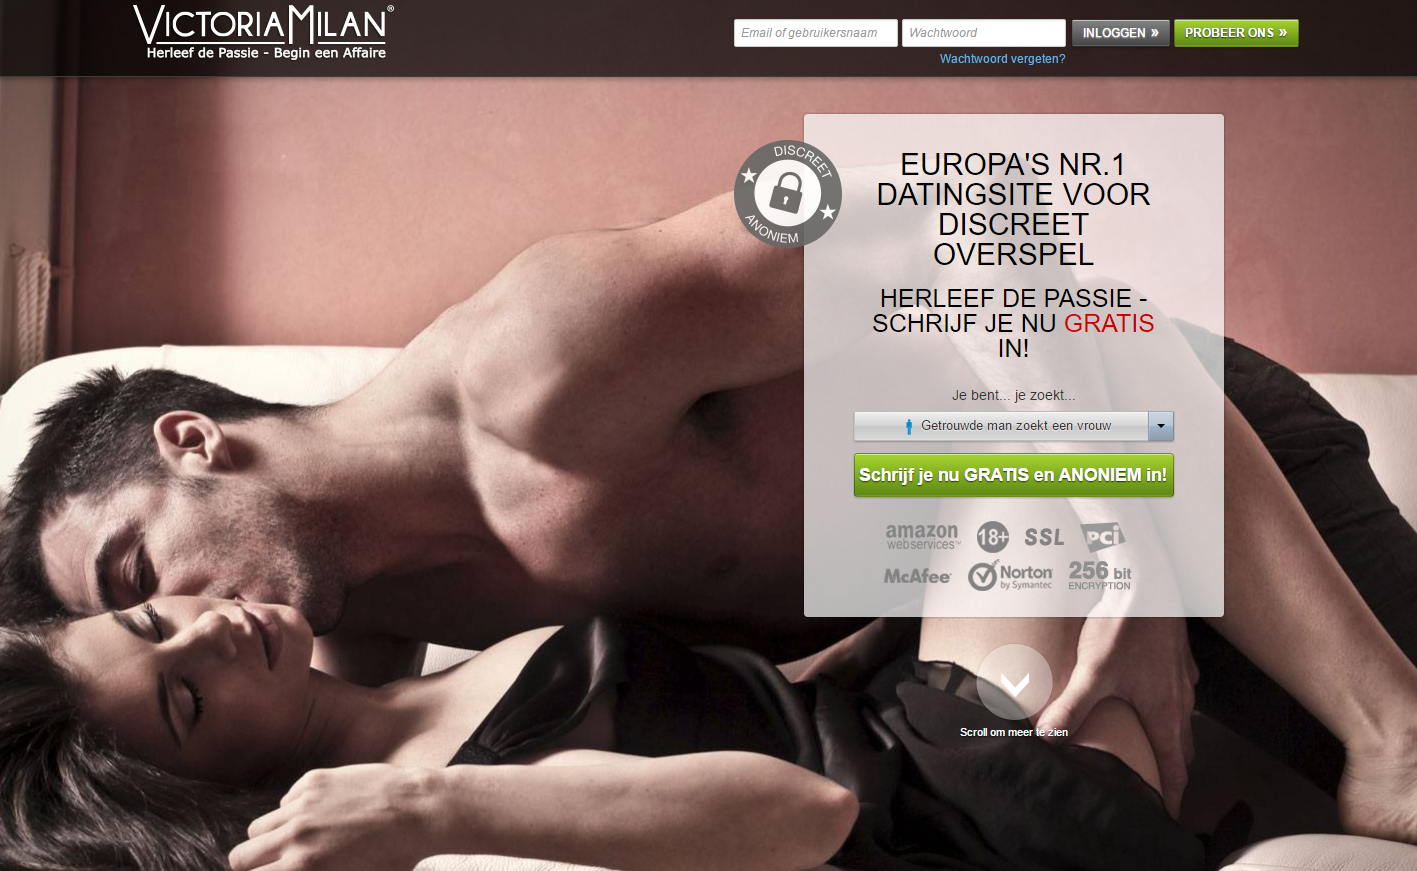 datingsites belgie gratis Westland